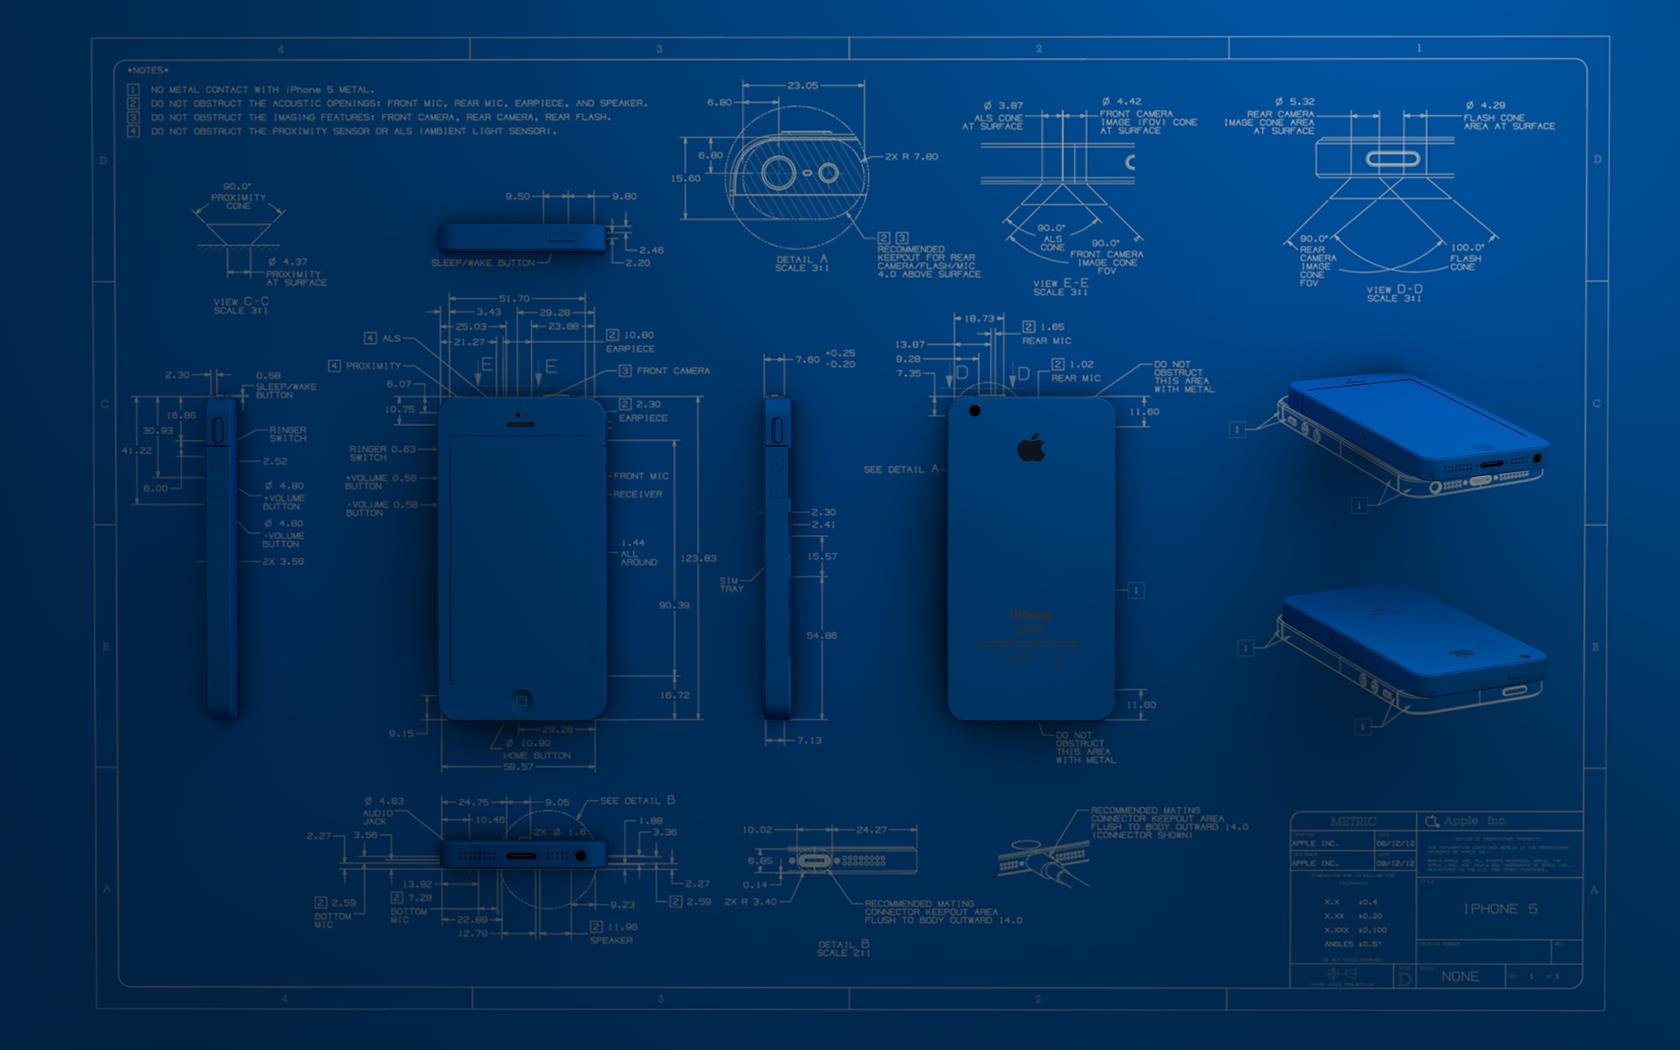 Iphone ios10 blueprint wallpaper by jessemunoz on deviantart blueprint 3d iphone 5 by dracu teufel666 malvernweather Image collections